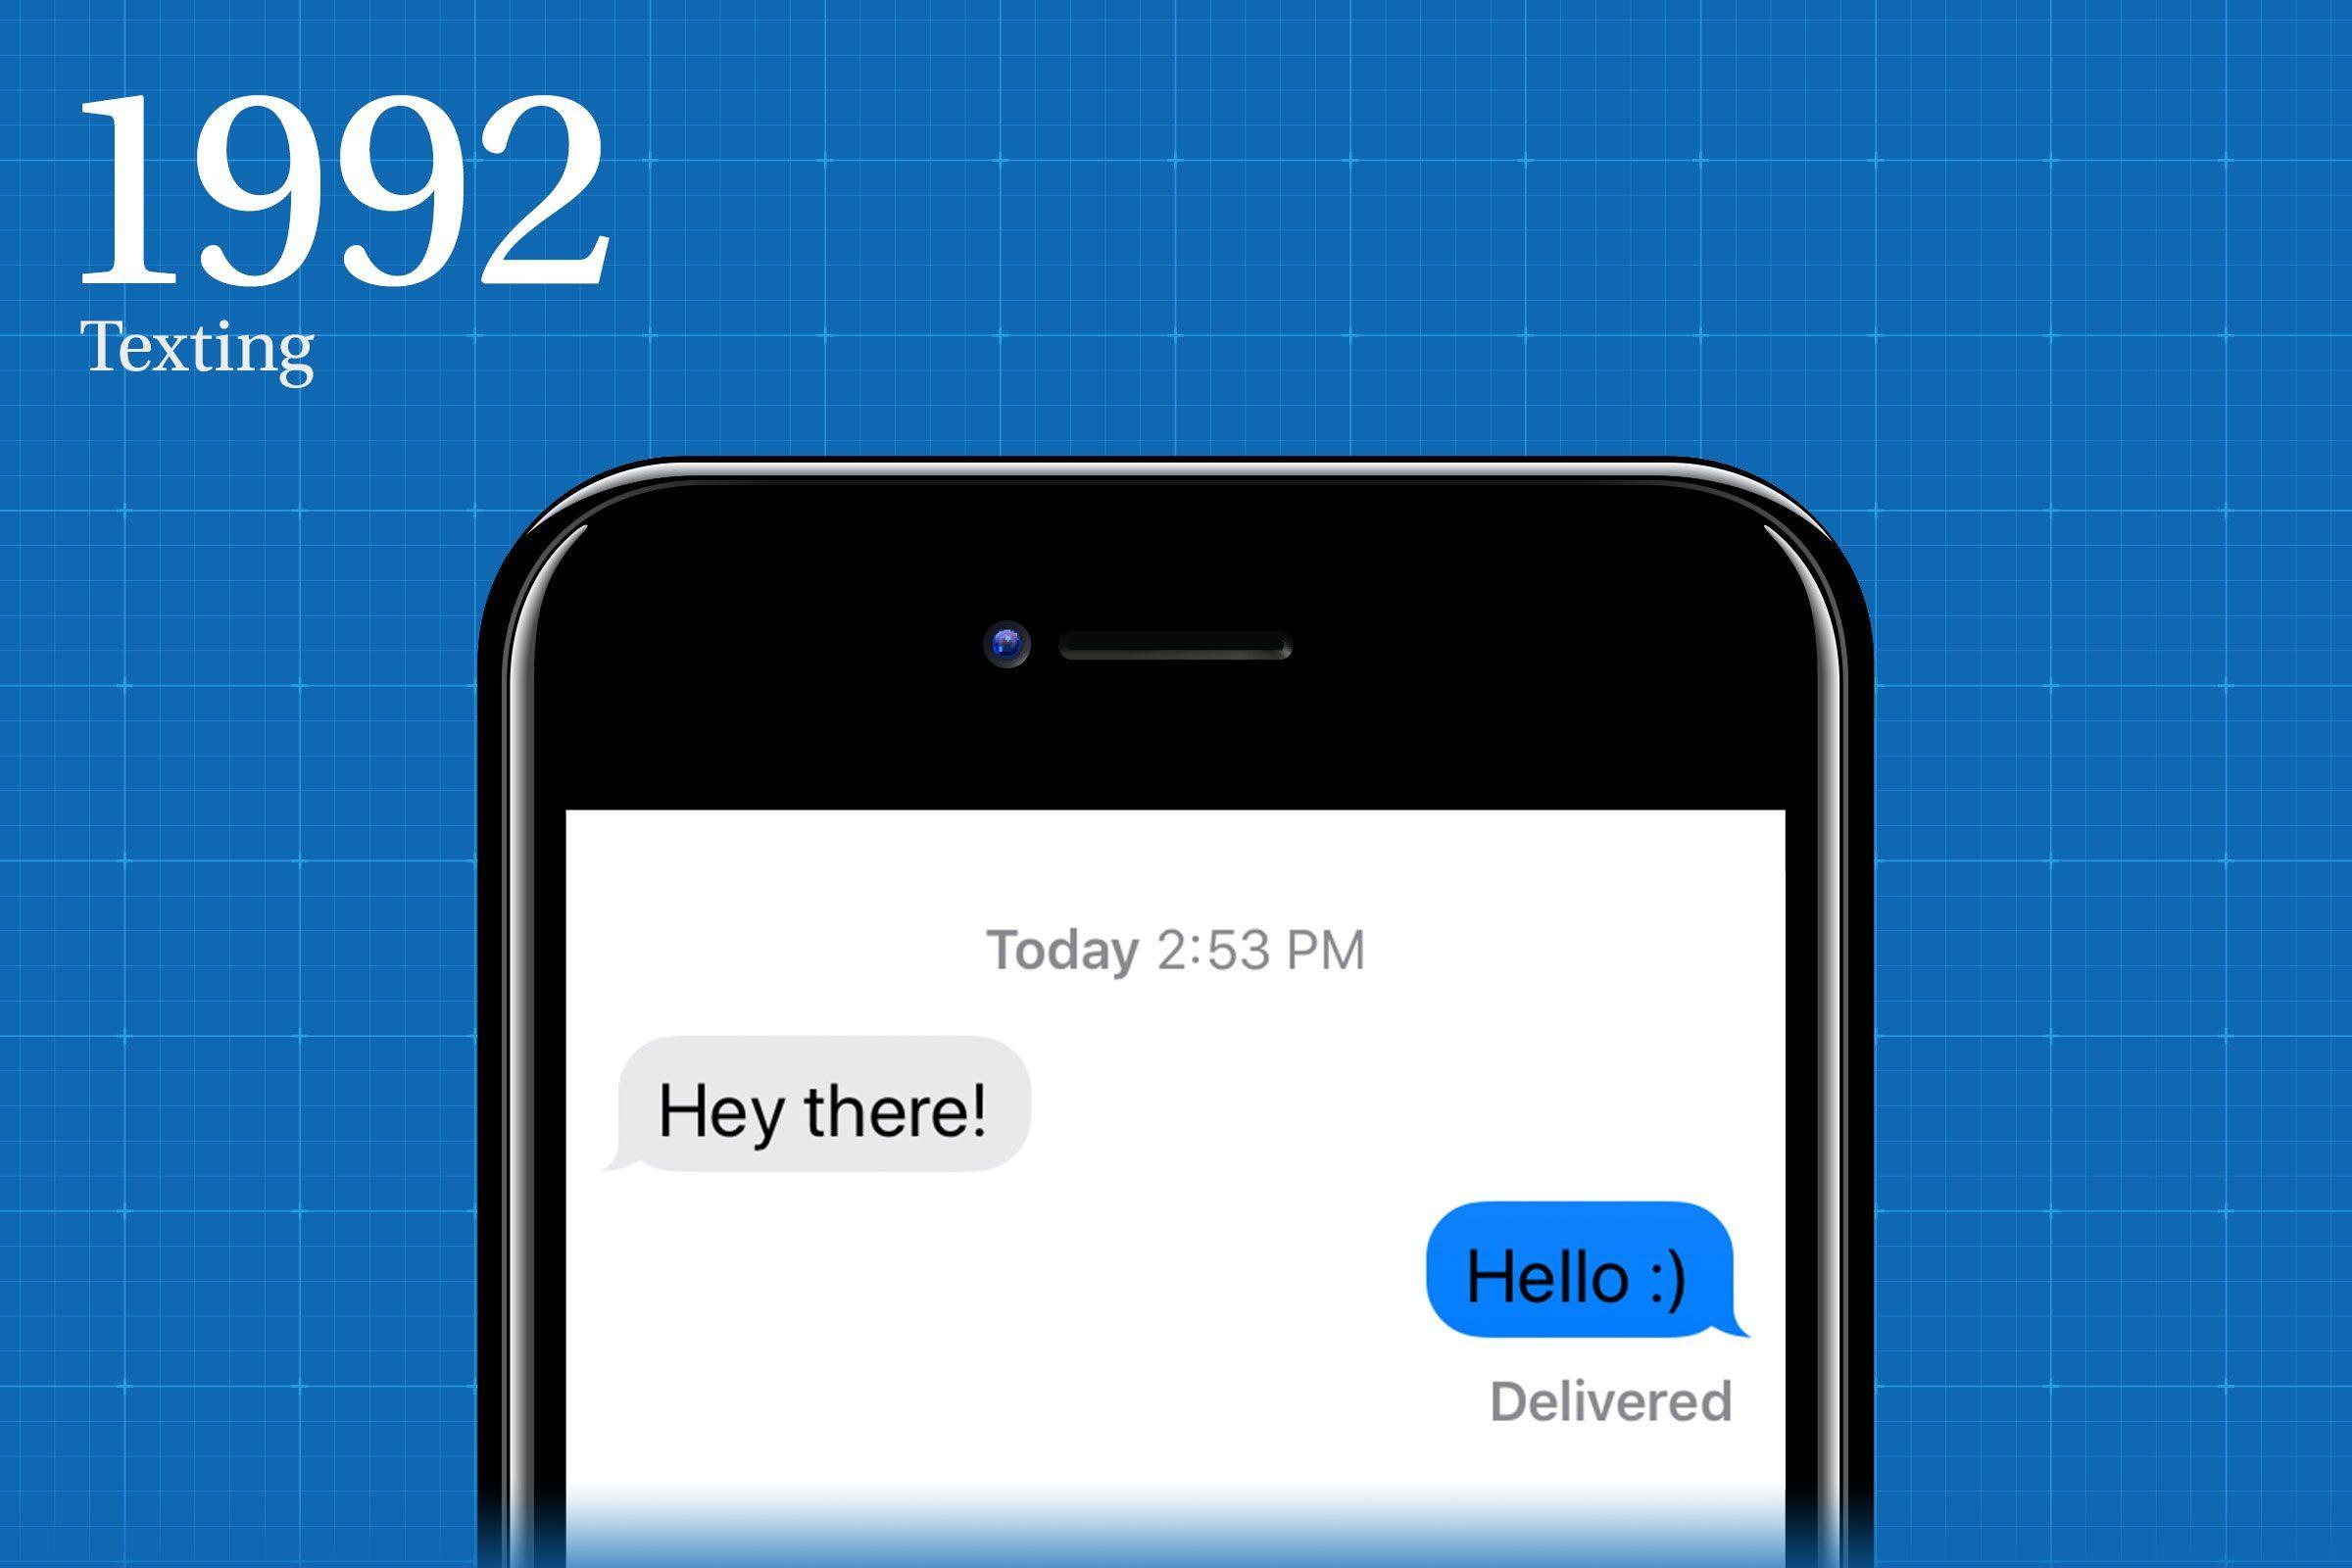 1992: Texting